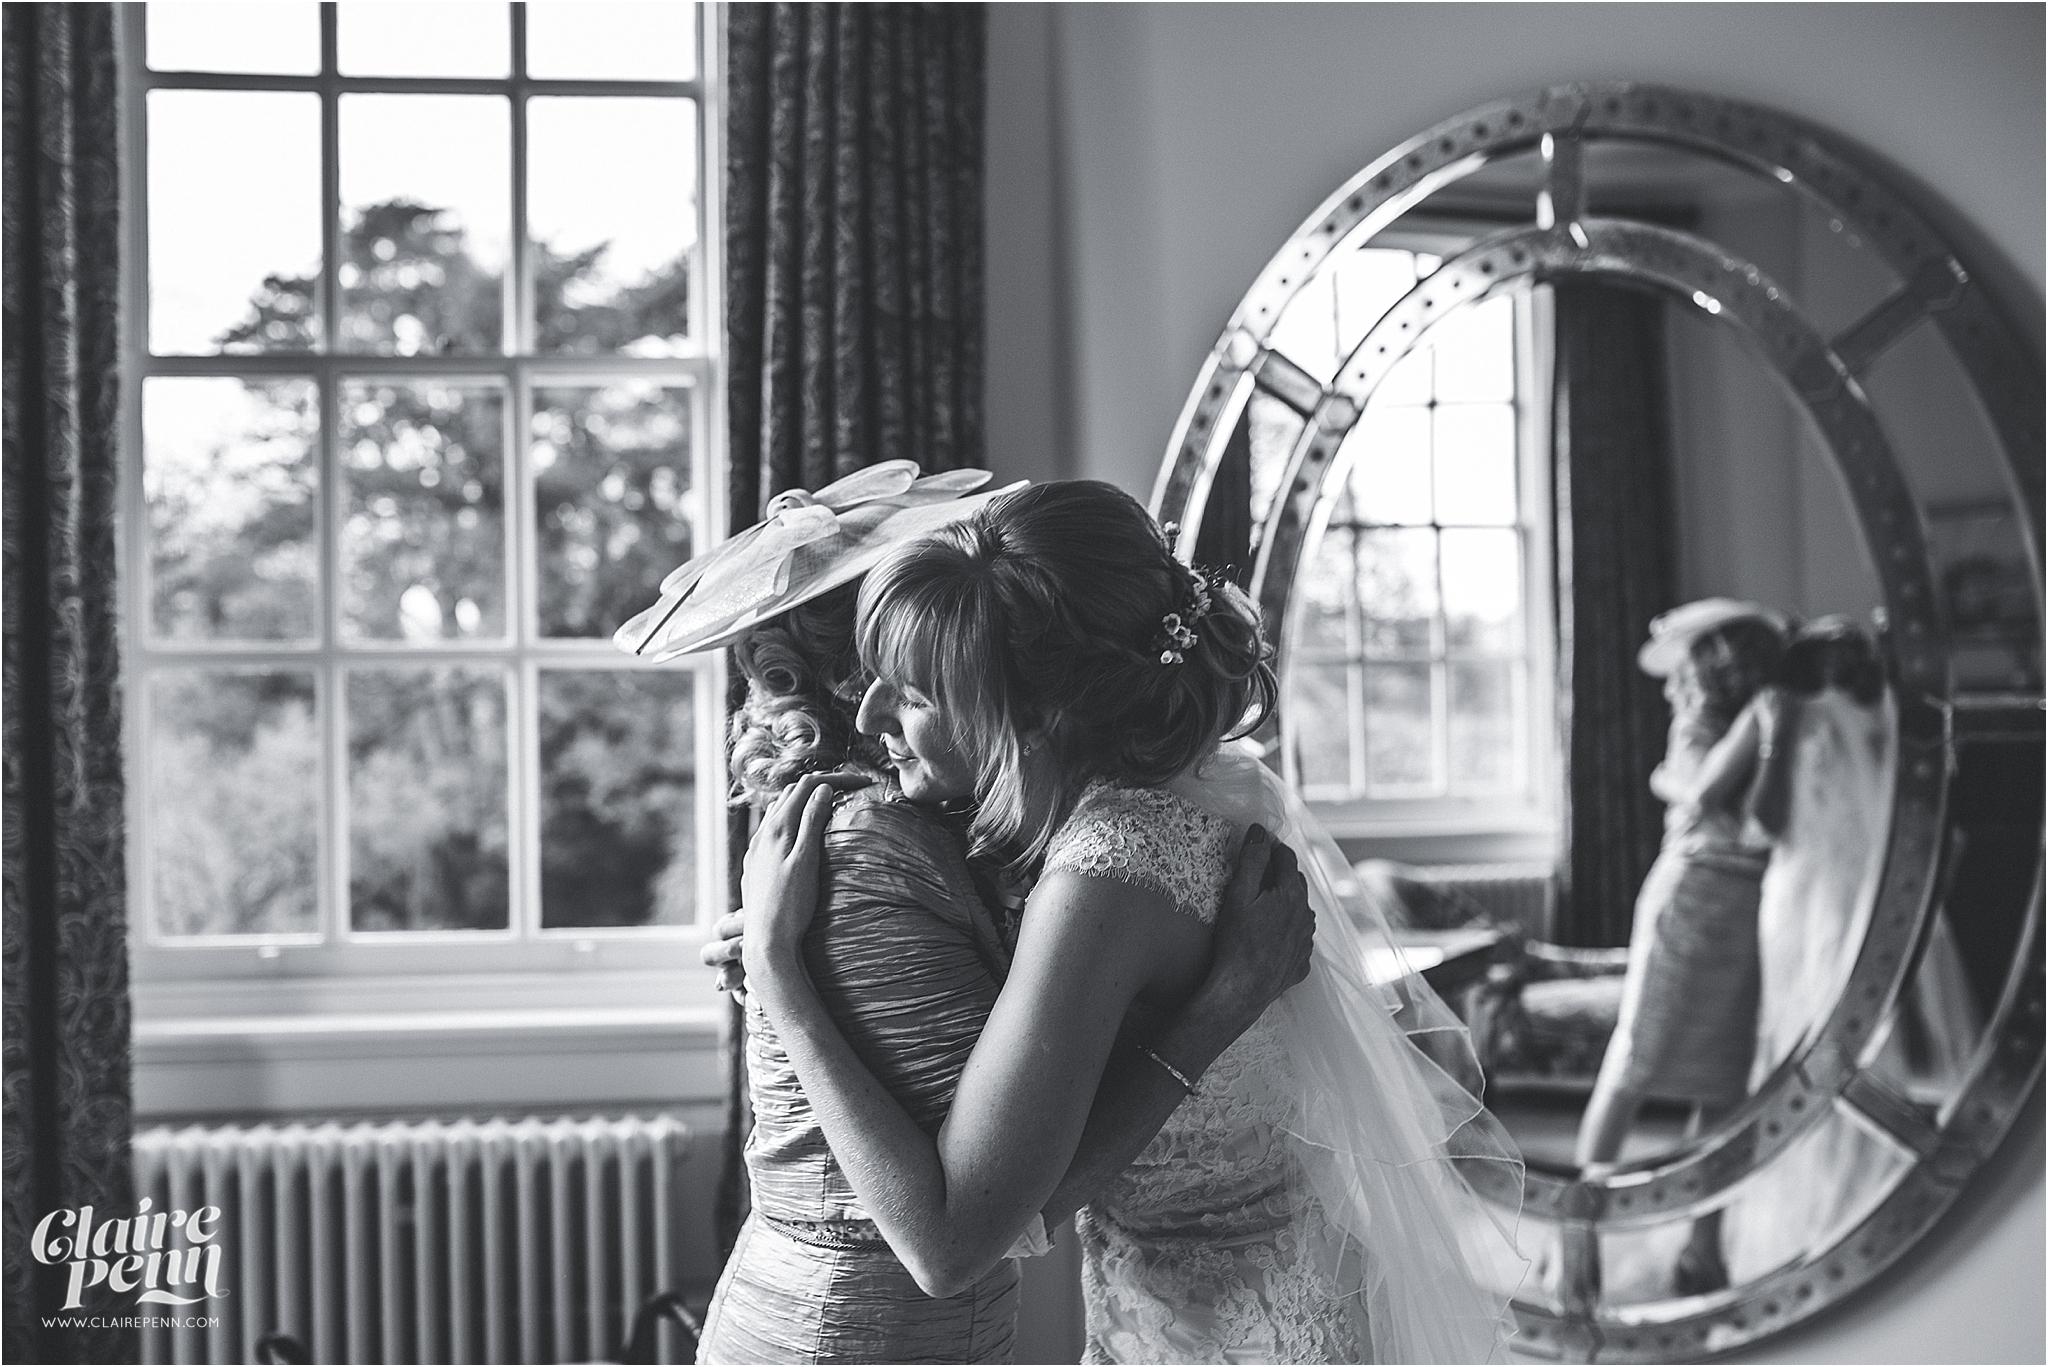 Iscoyd Park wedding, Whitchurch, Cheshire wedding photographer_0012.jpg